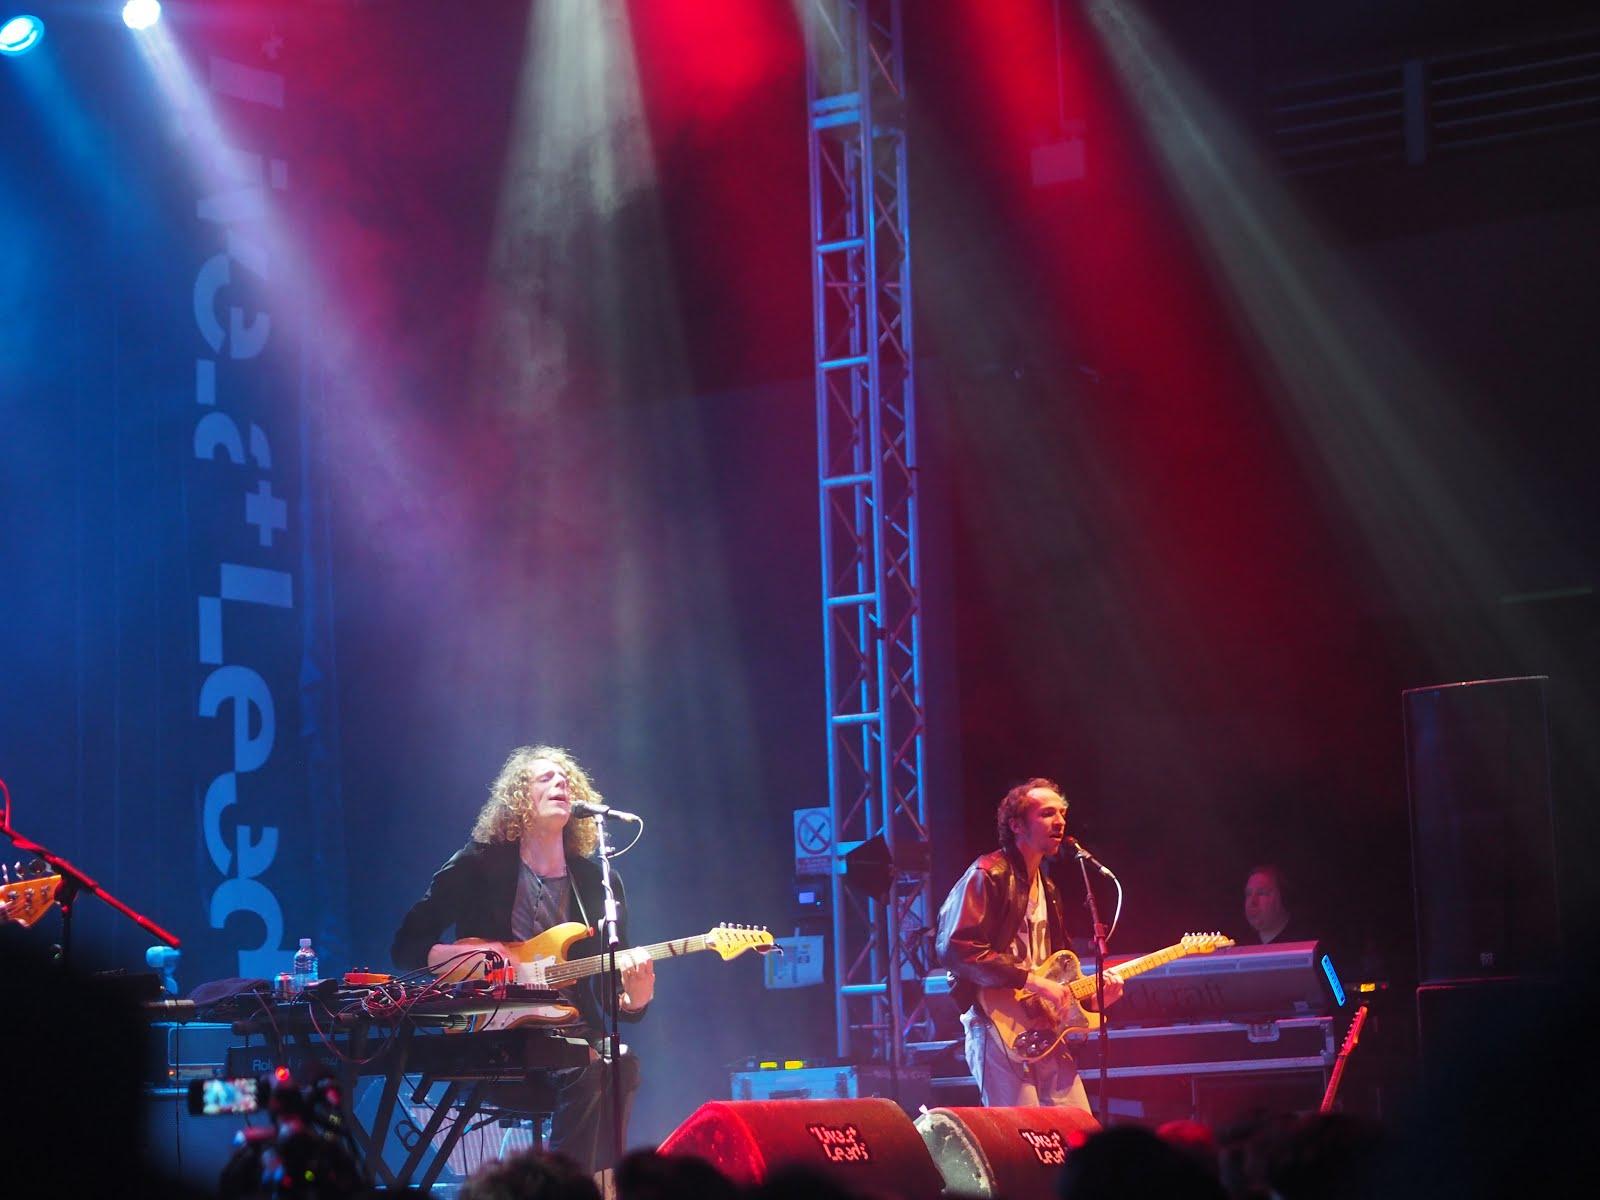 Live at Leeds 2016